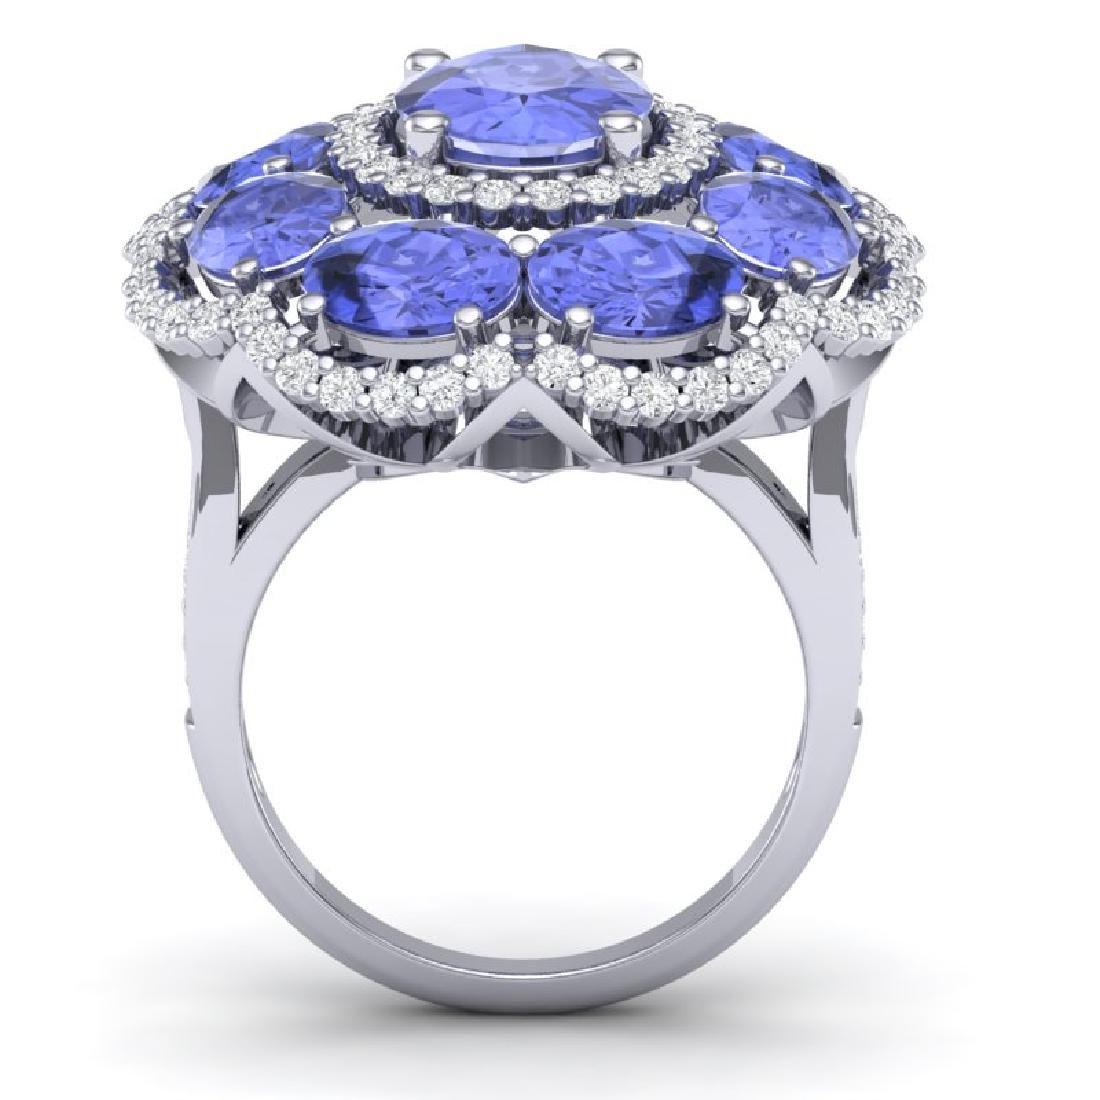 15.24 CTW Royalty Tanzanite & VS Diamond Ring 18K White - 3